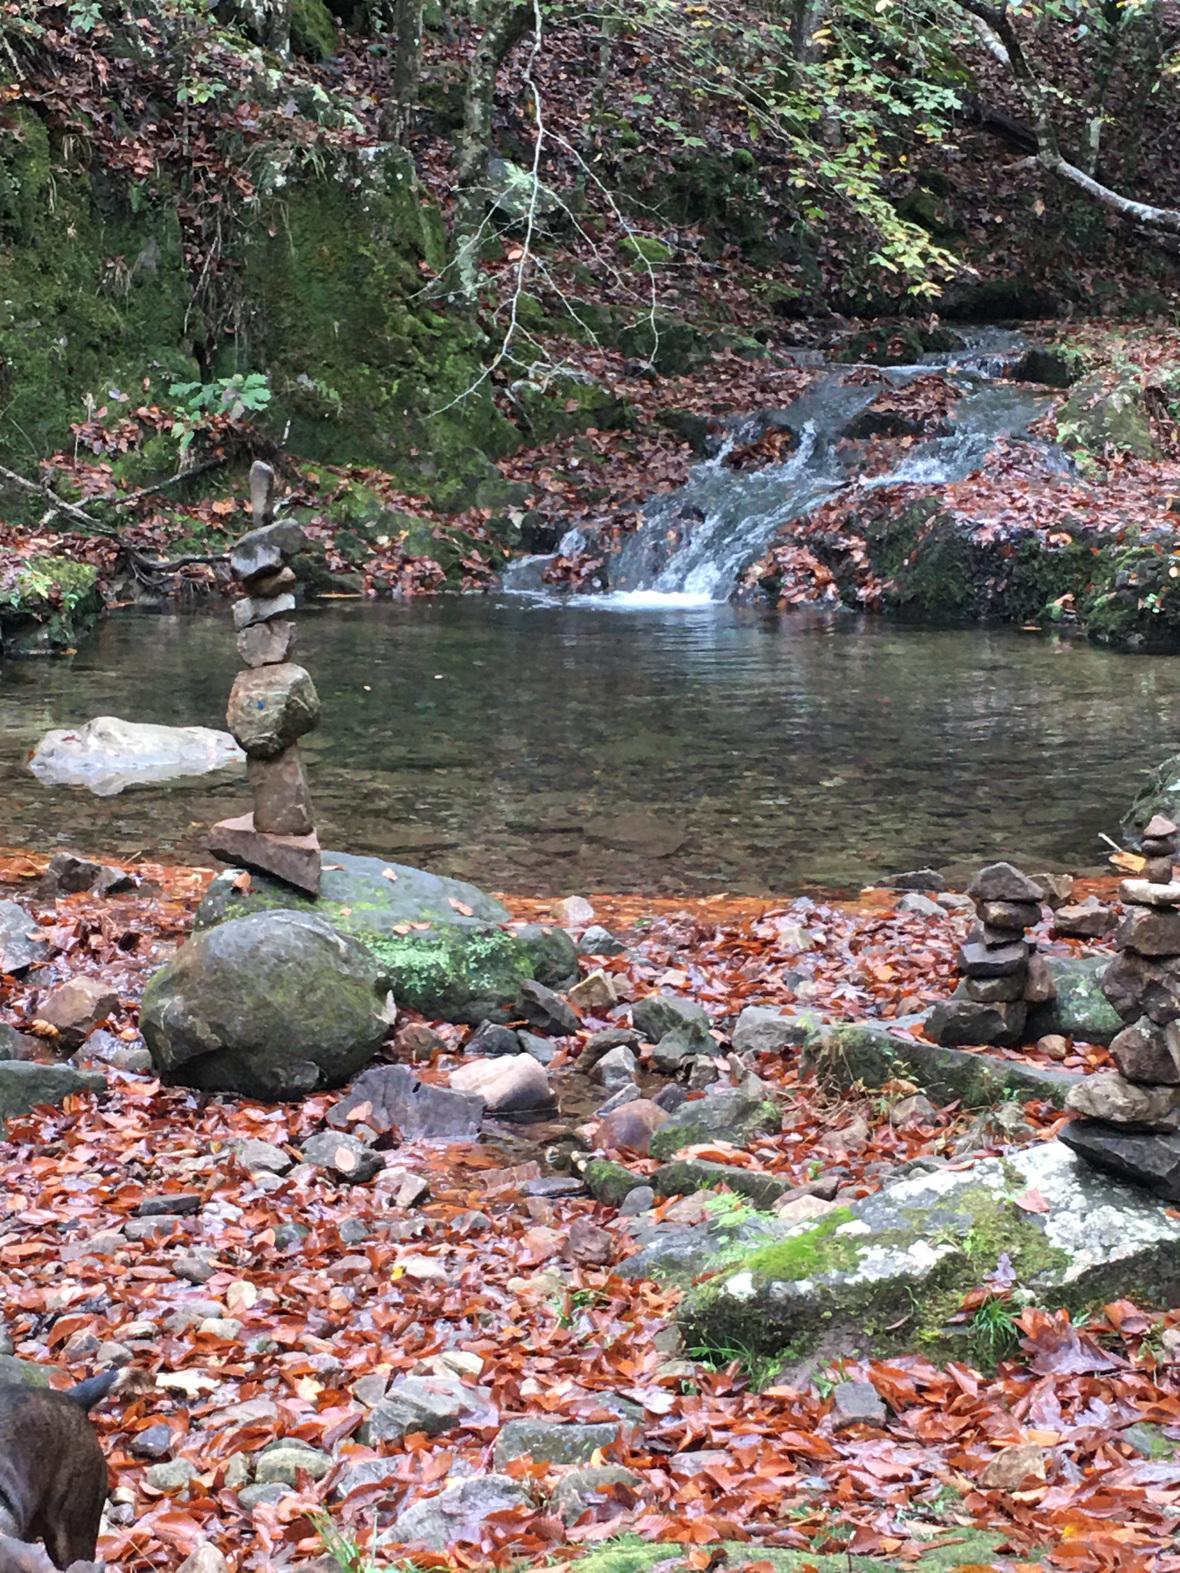 JuneWksp-Stream with water inflow